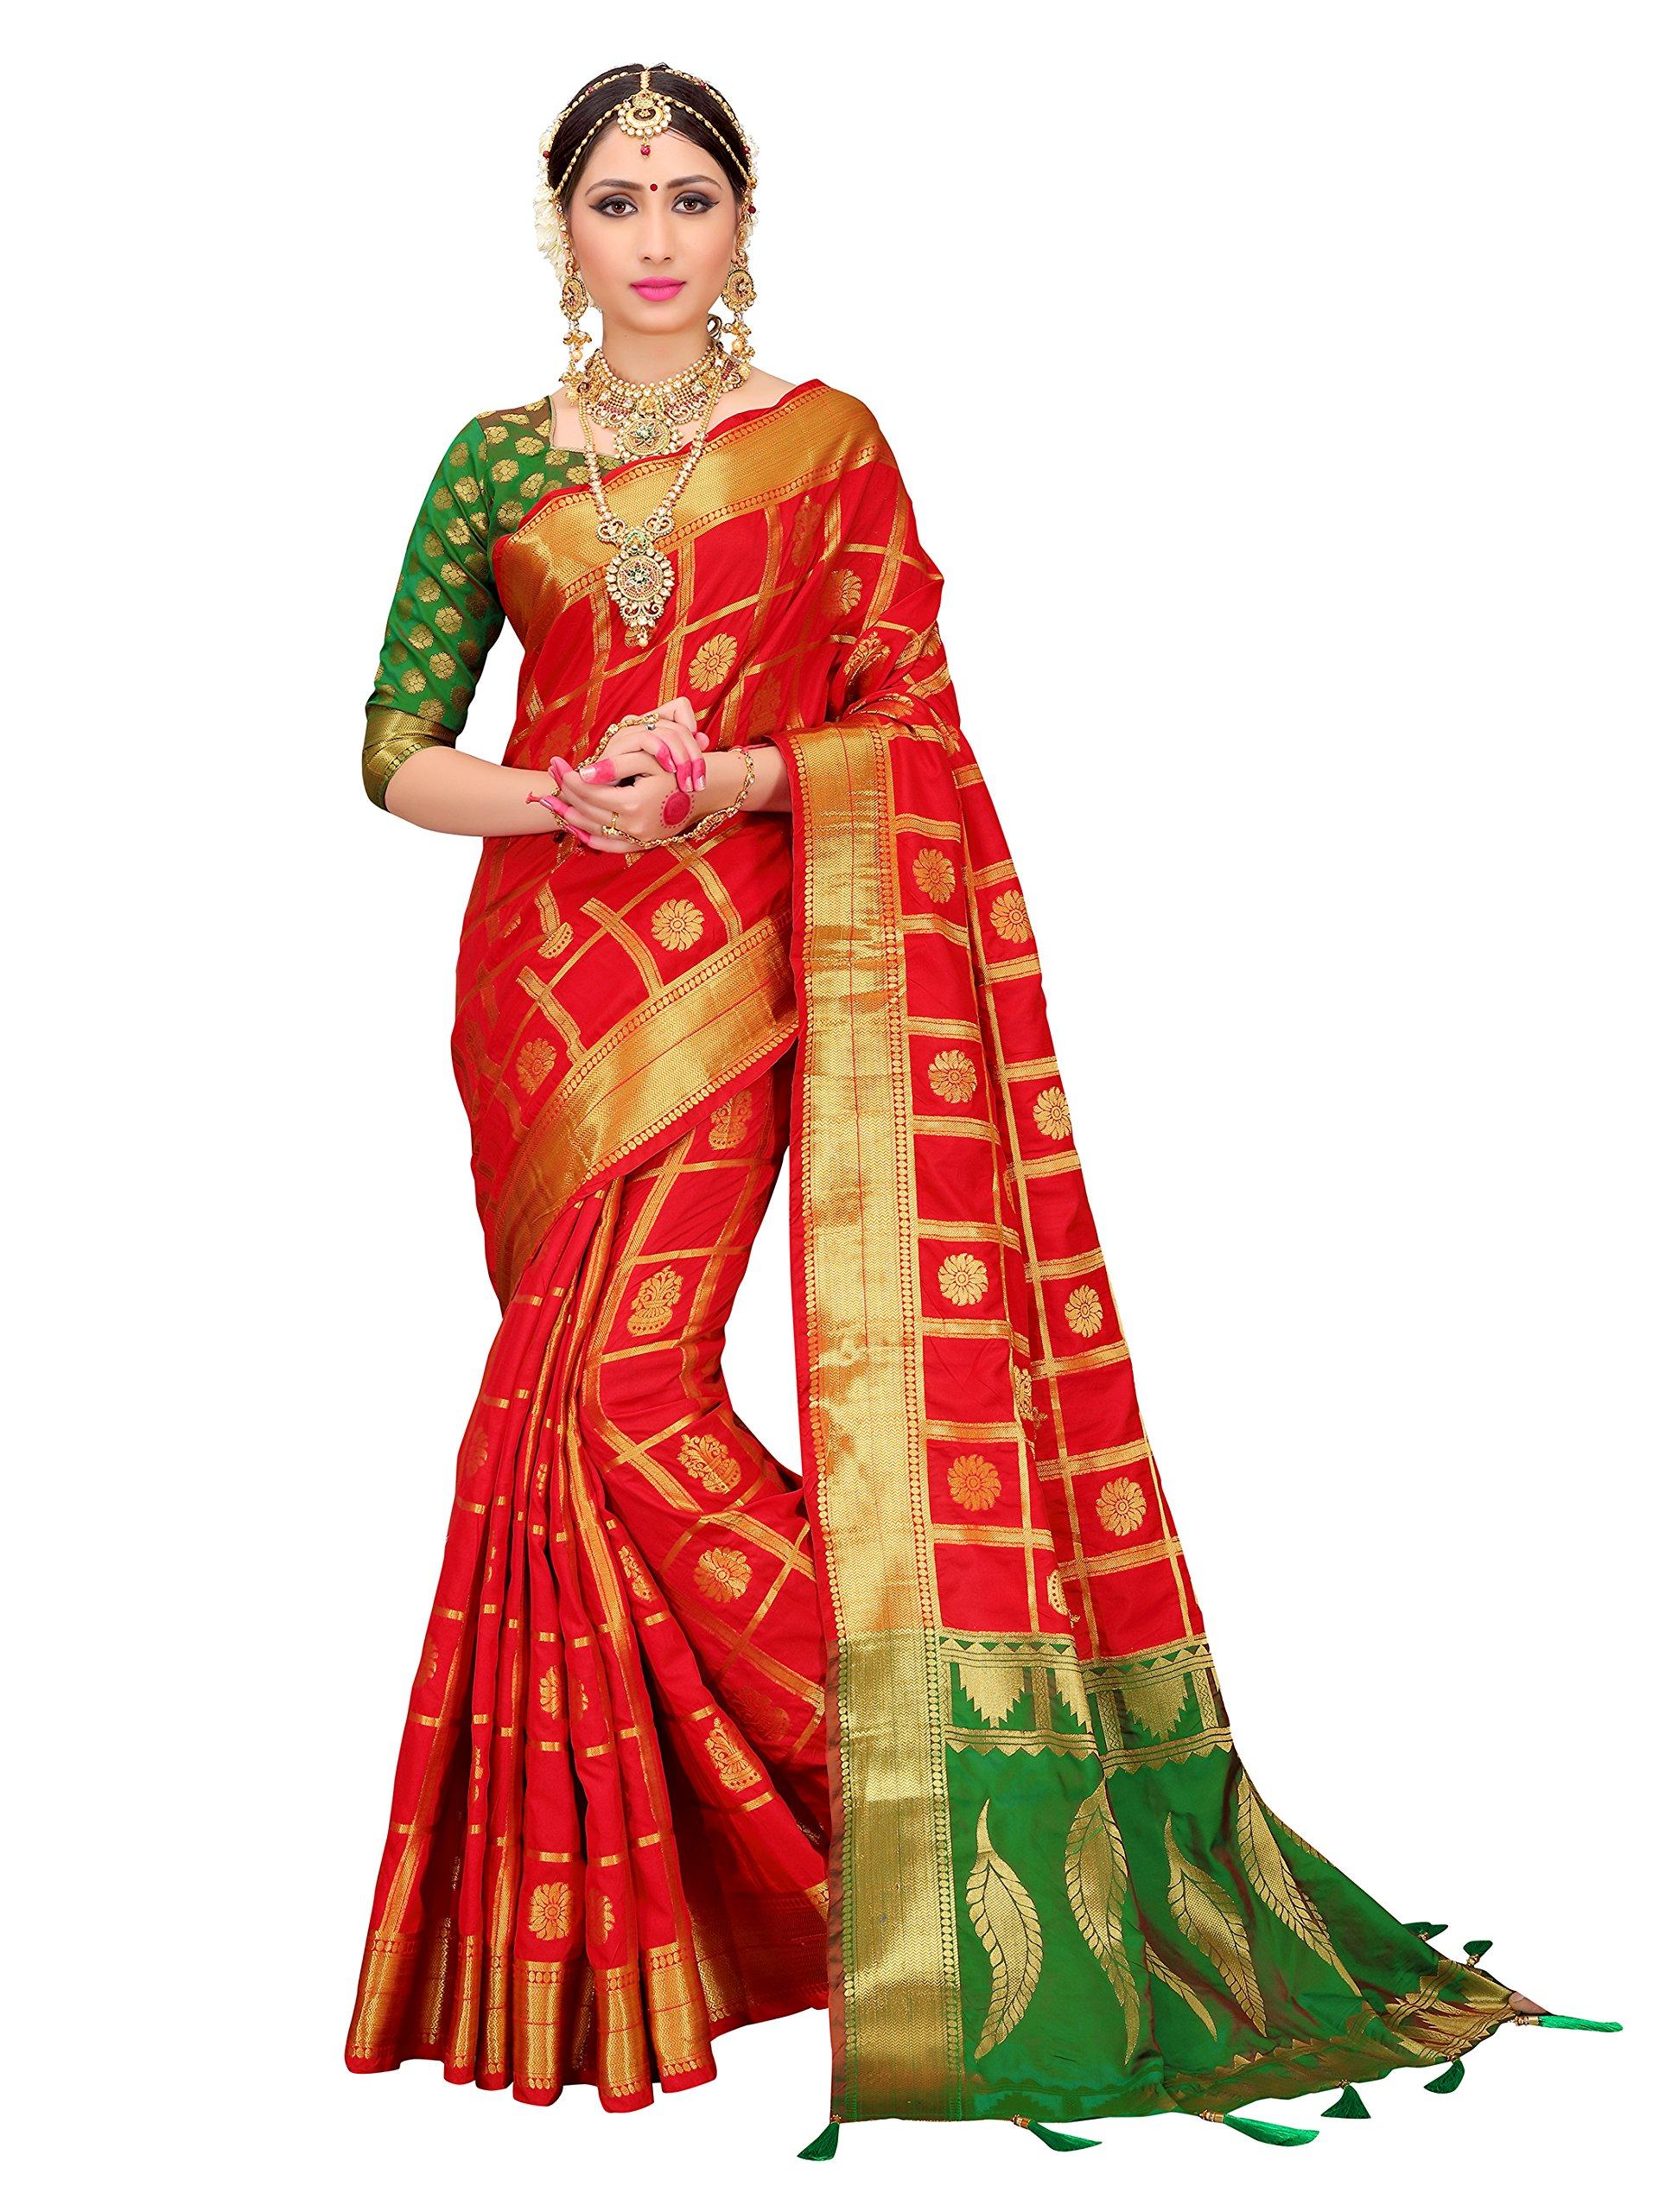 ELINA FASHION Sarees for Women Patola Art Silk Woven Work Saree l Indian Wedding Ethnic Sari with Blouse Piece (Red 1)